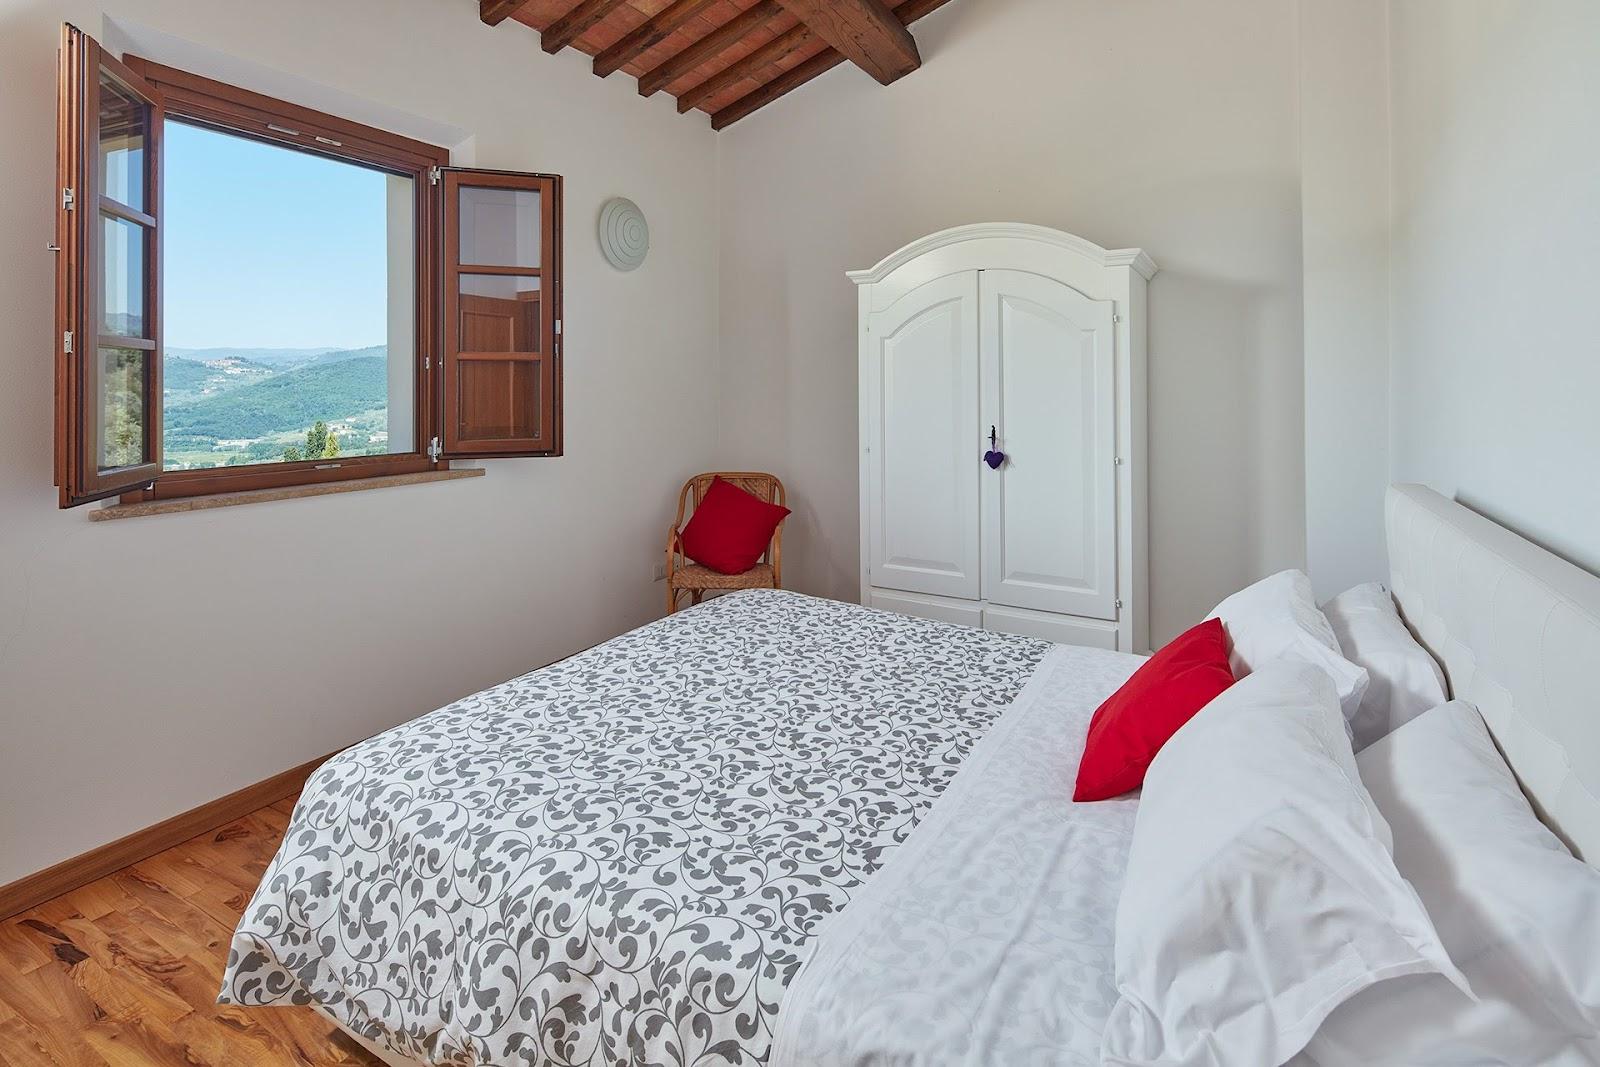 Ferienhaus Corte Paradiso (2570342), Monsummano Terme, Pistoia, Toskana, Italien, Bild 24